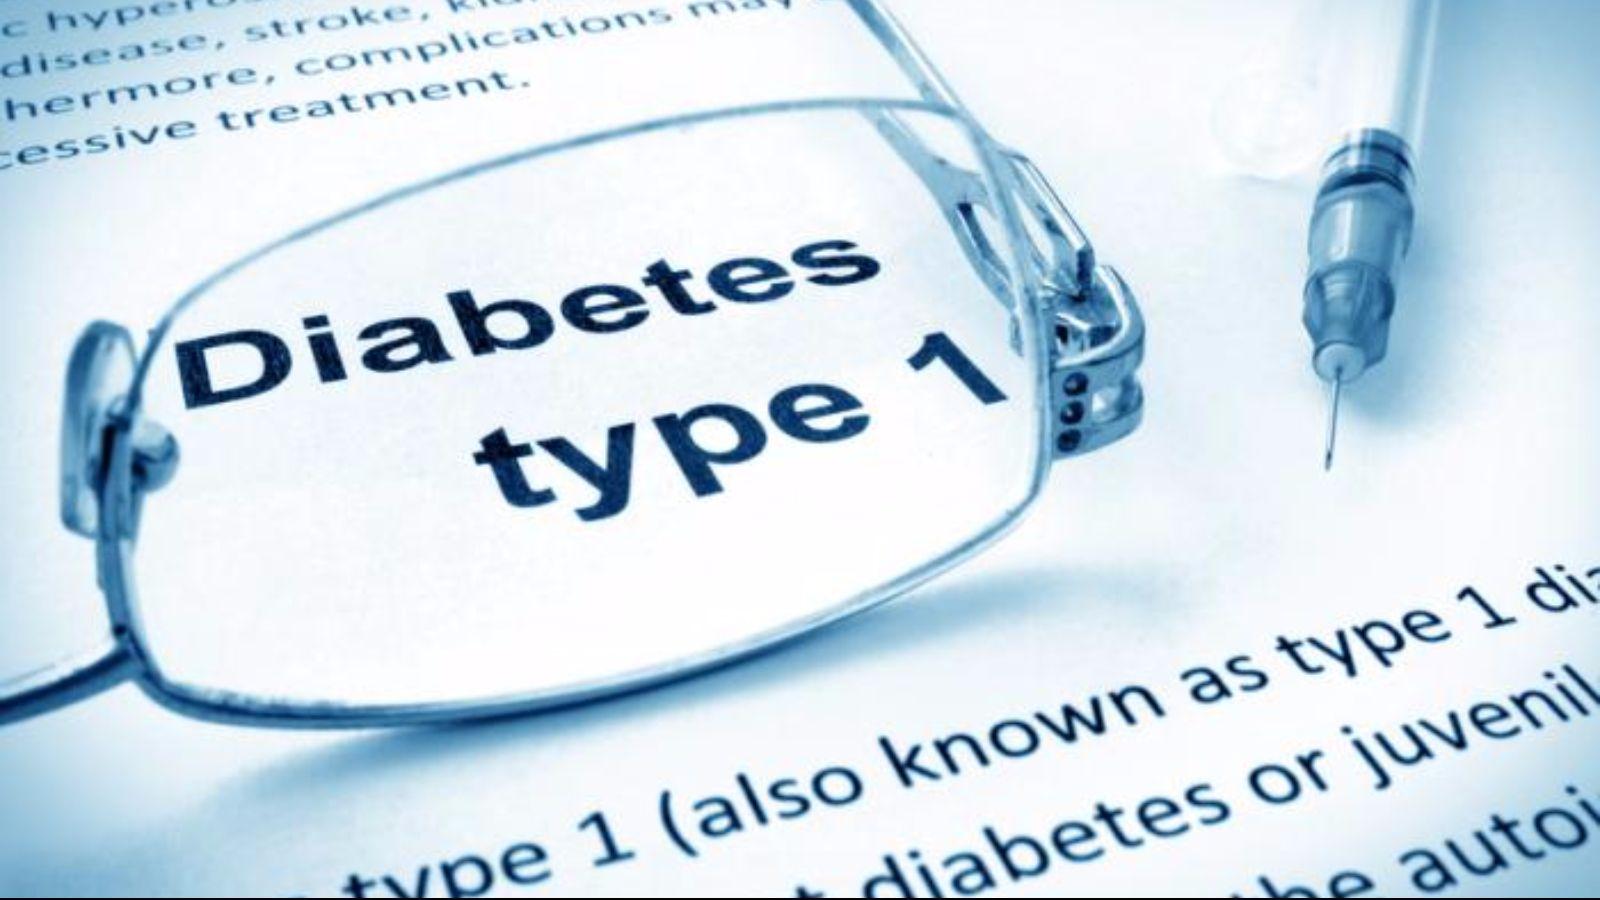 type-1-diabetes-with-definition | orangebean indiana